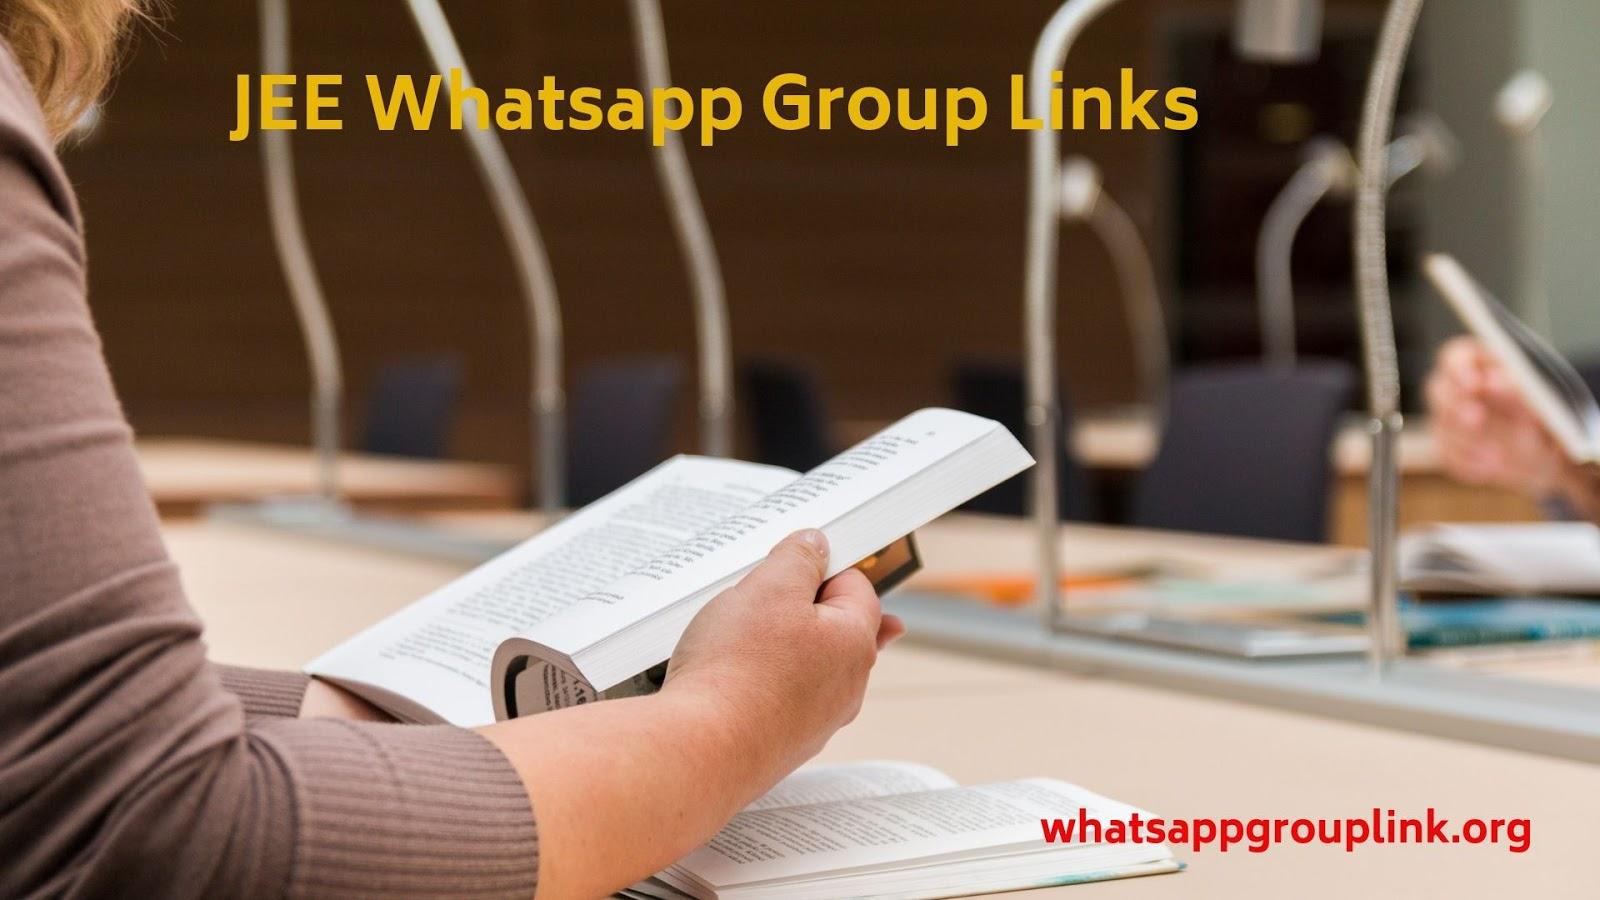 Whatsapp Group Link: JEE Whatsapp Group Links